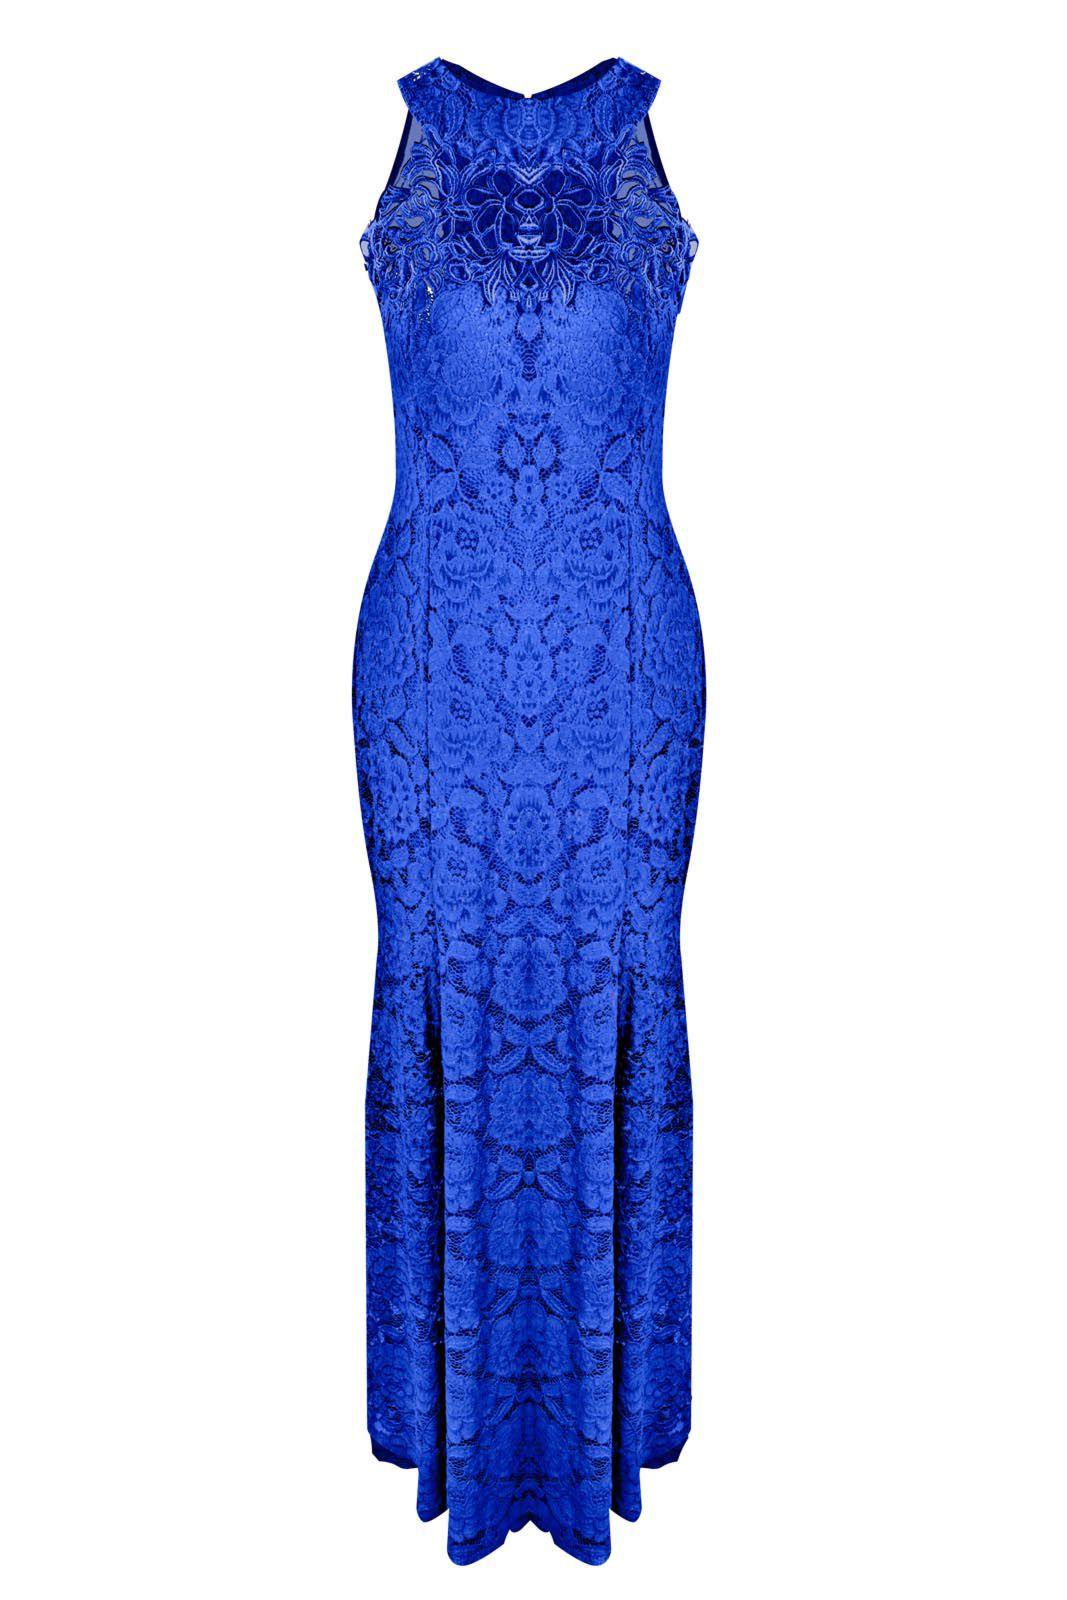 Vestido Outlet Dri Festa Formatura Longo Rendado Detalhe Renda Guippir Azul